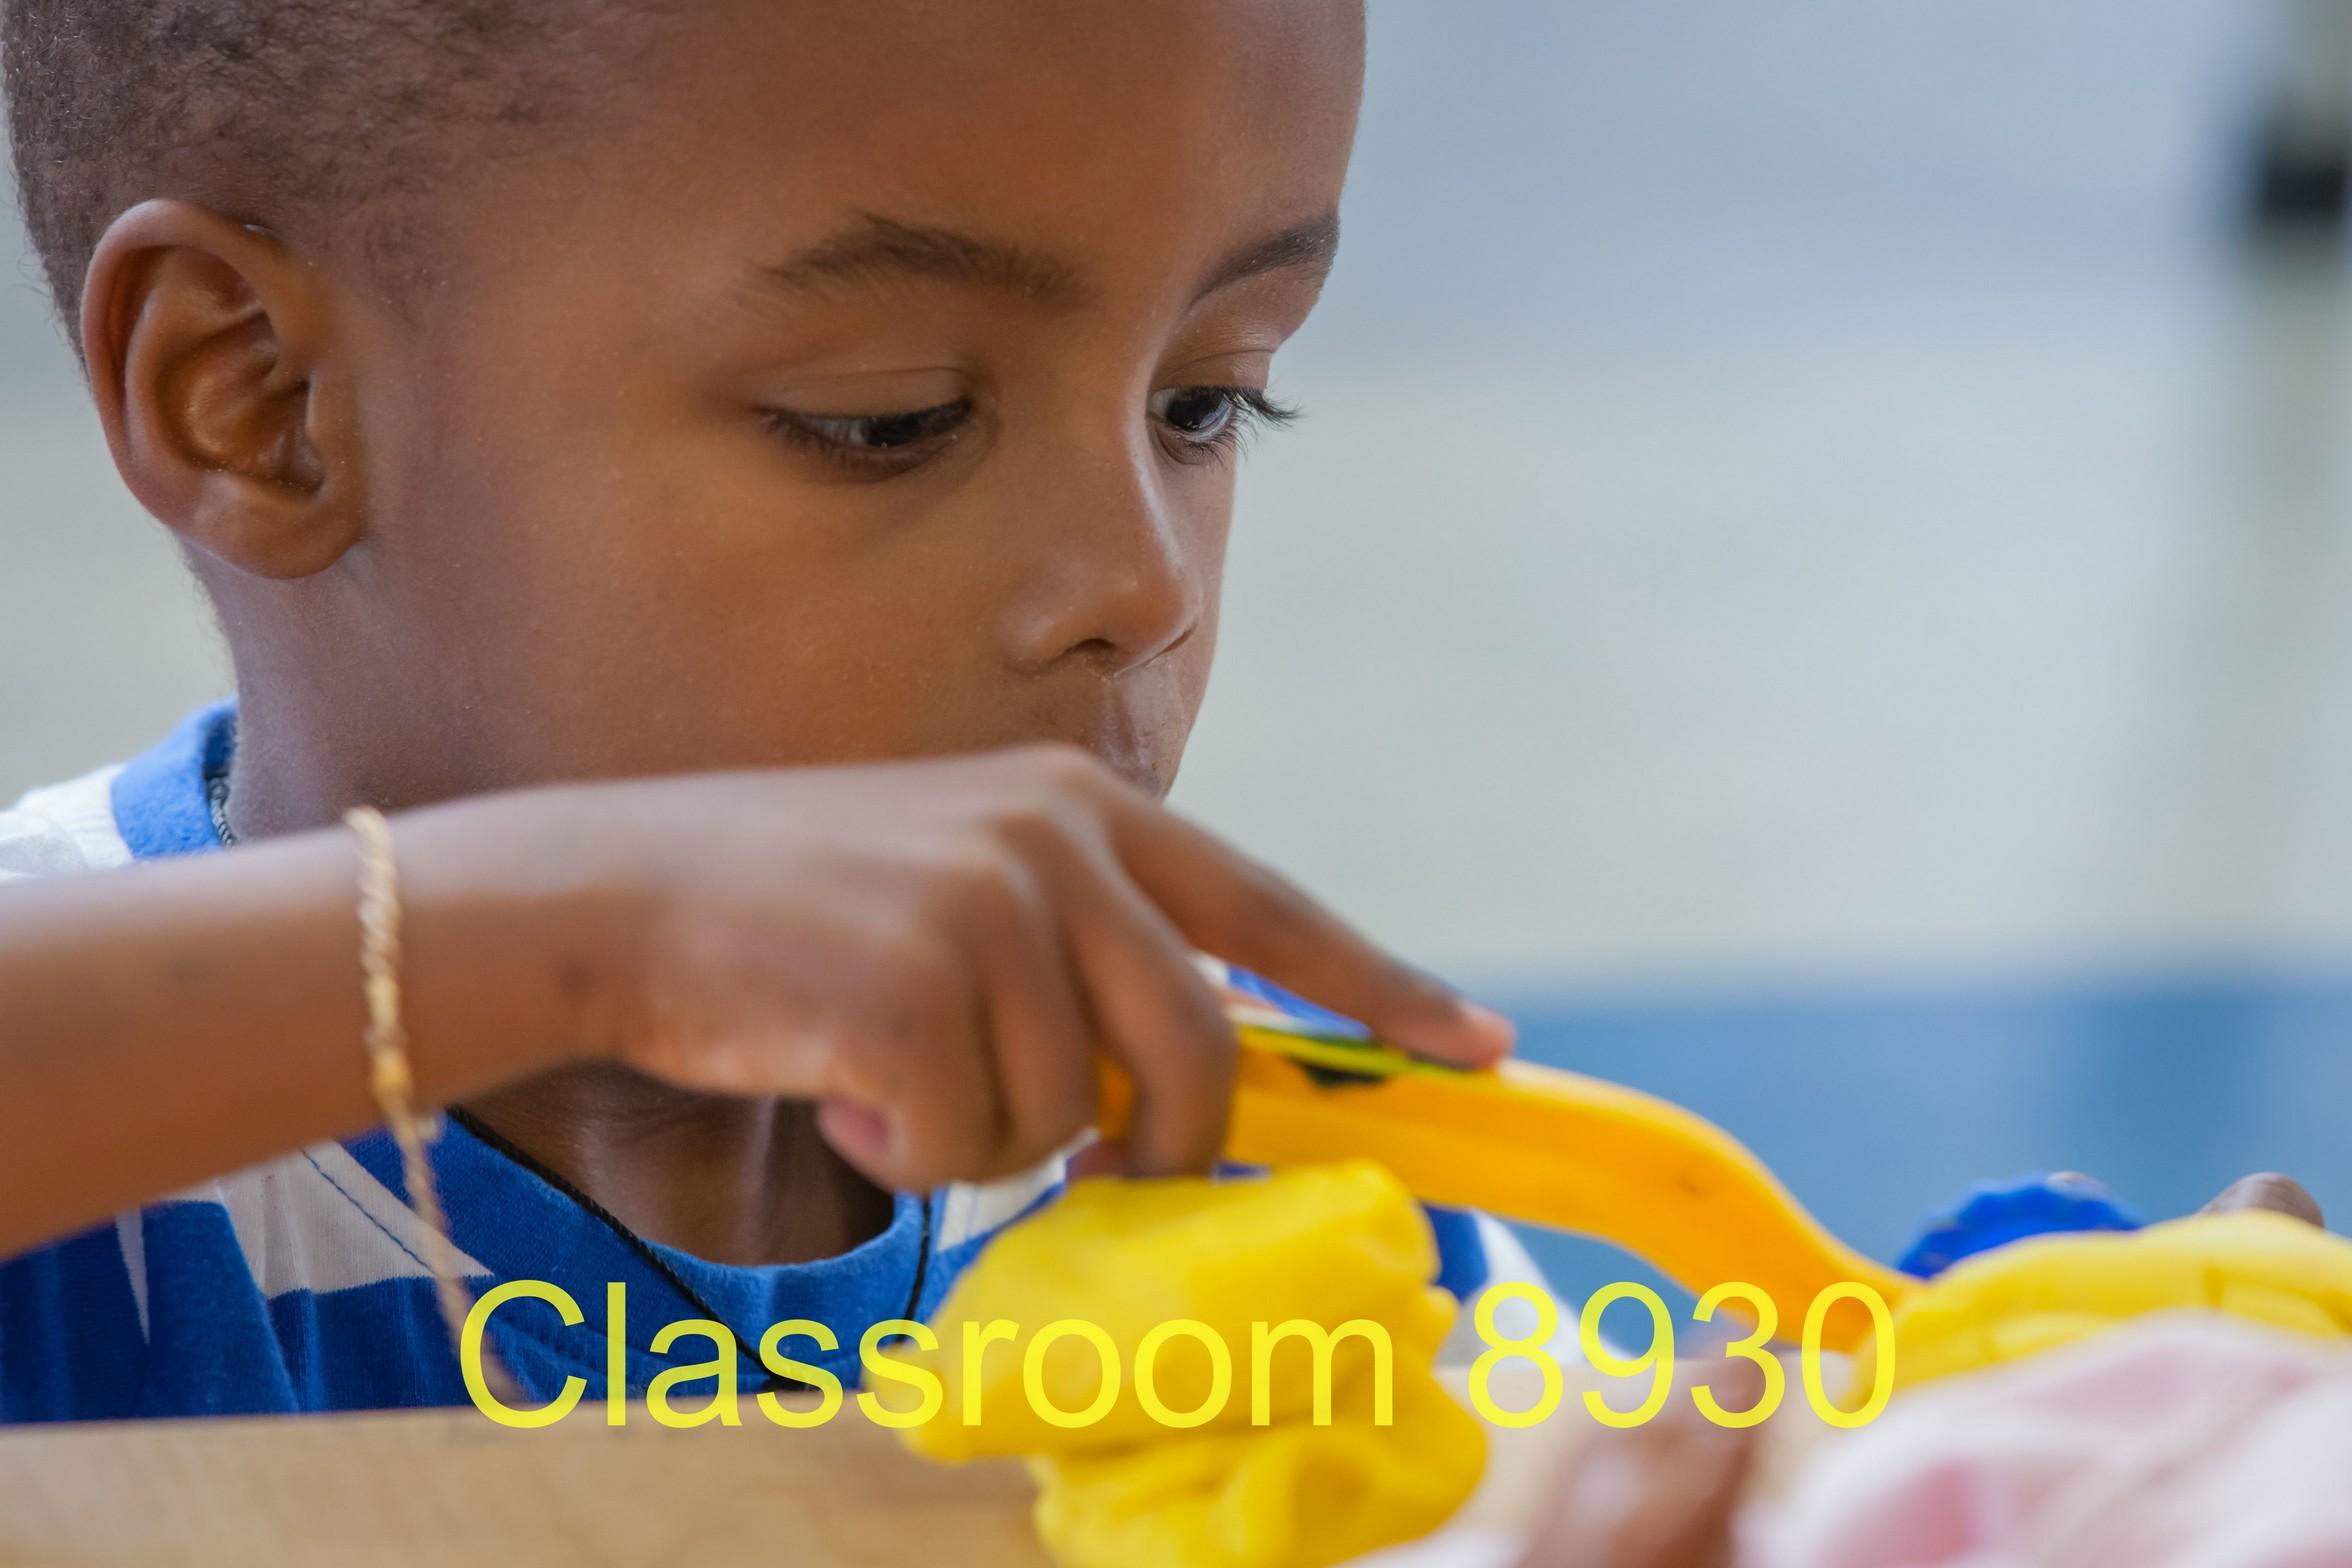 Classroom 8930